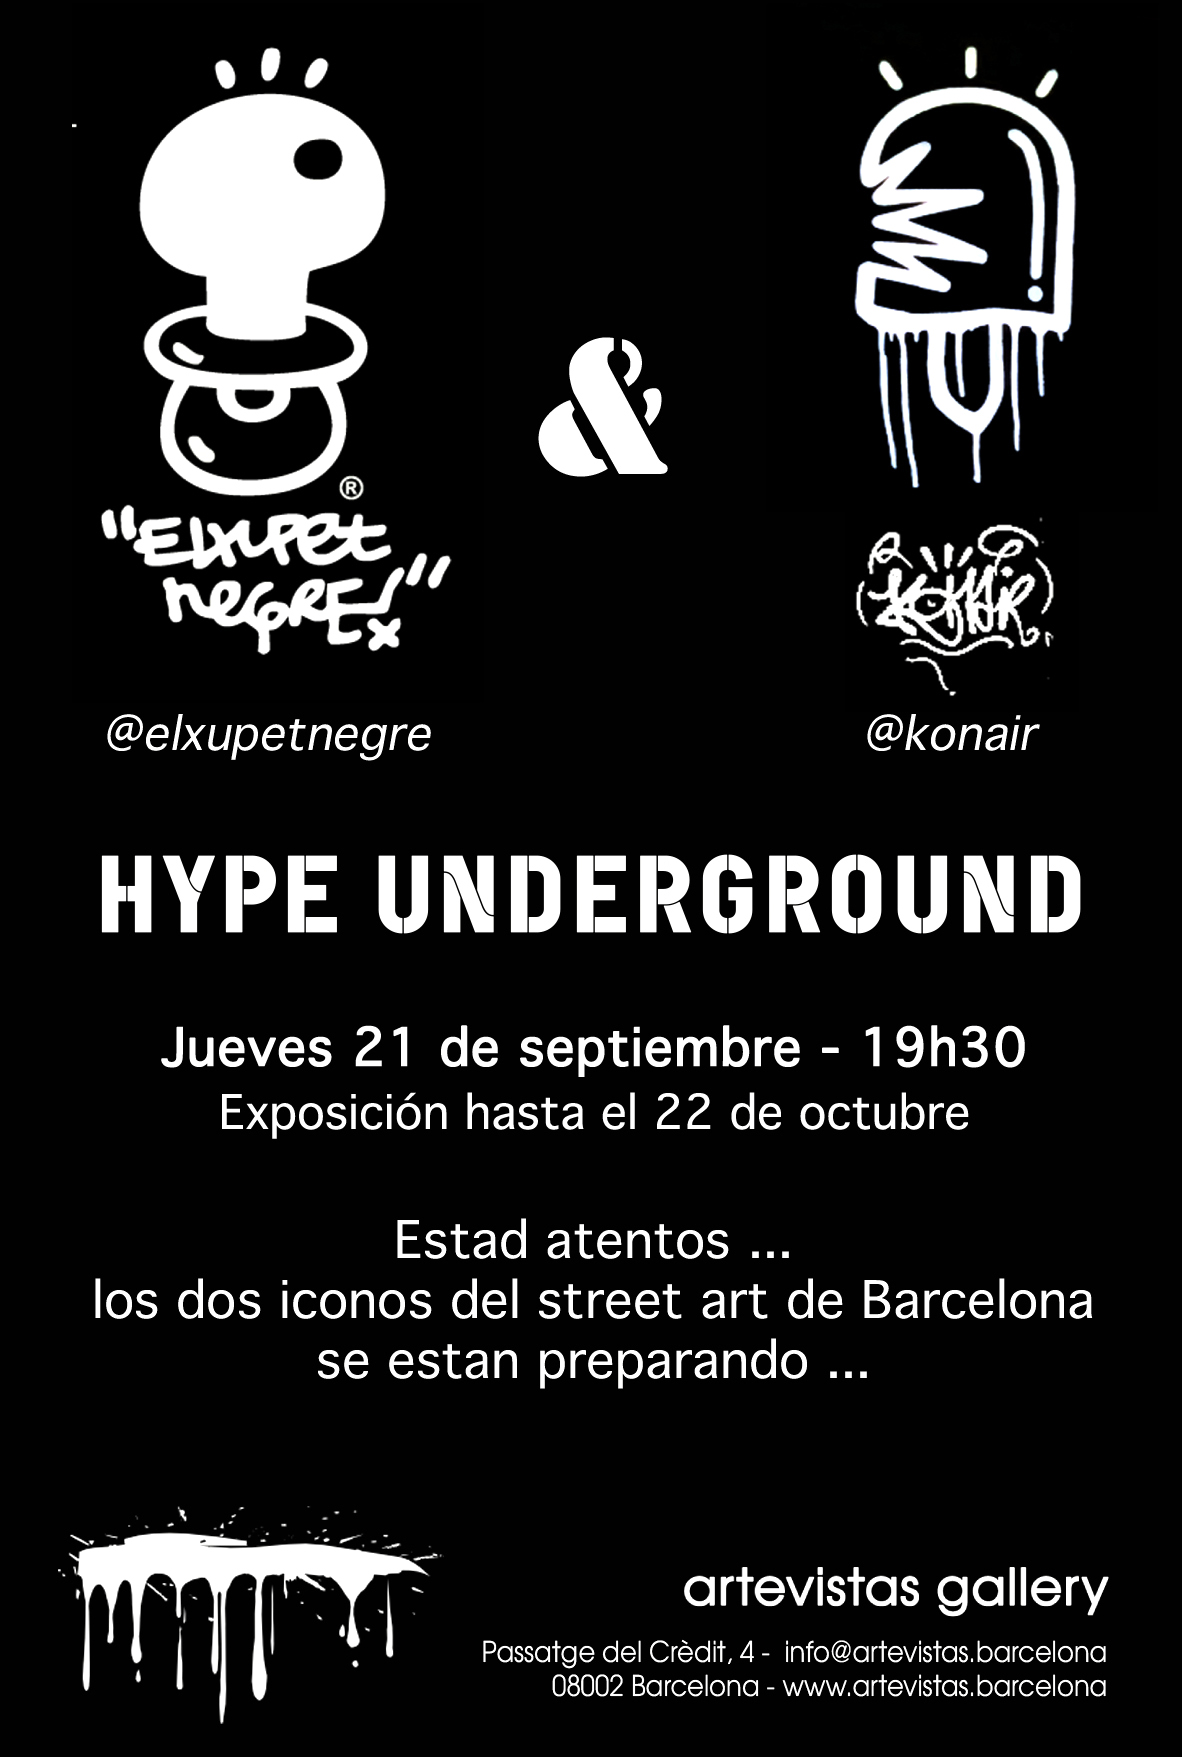 Hype Underground <br />El Xupet Negre & Konair